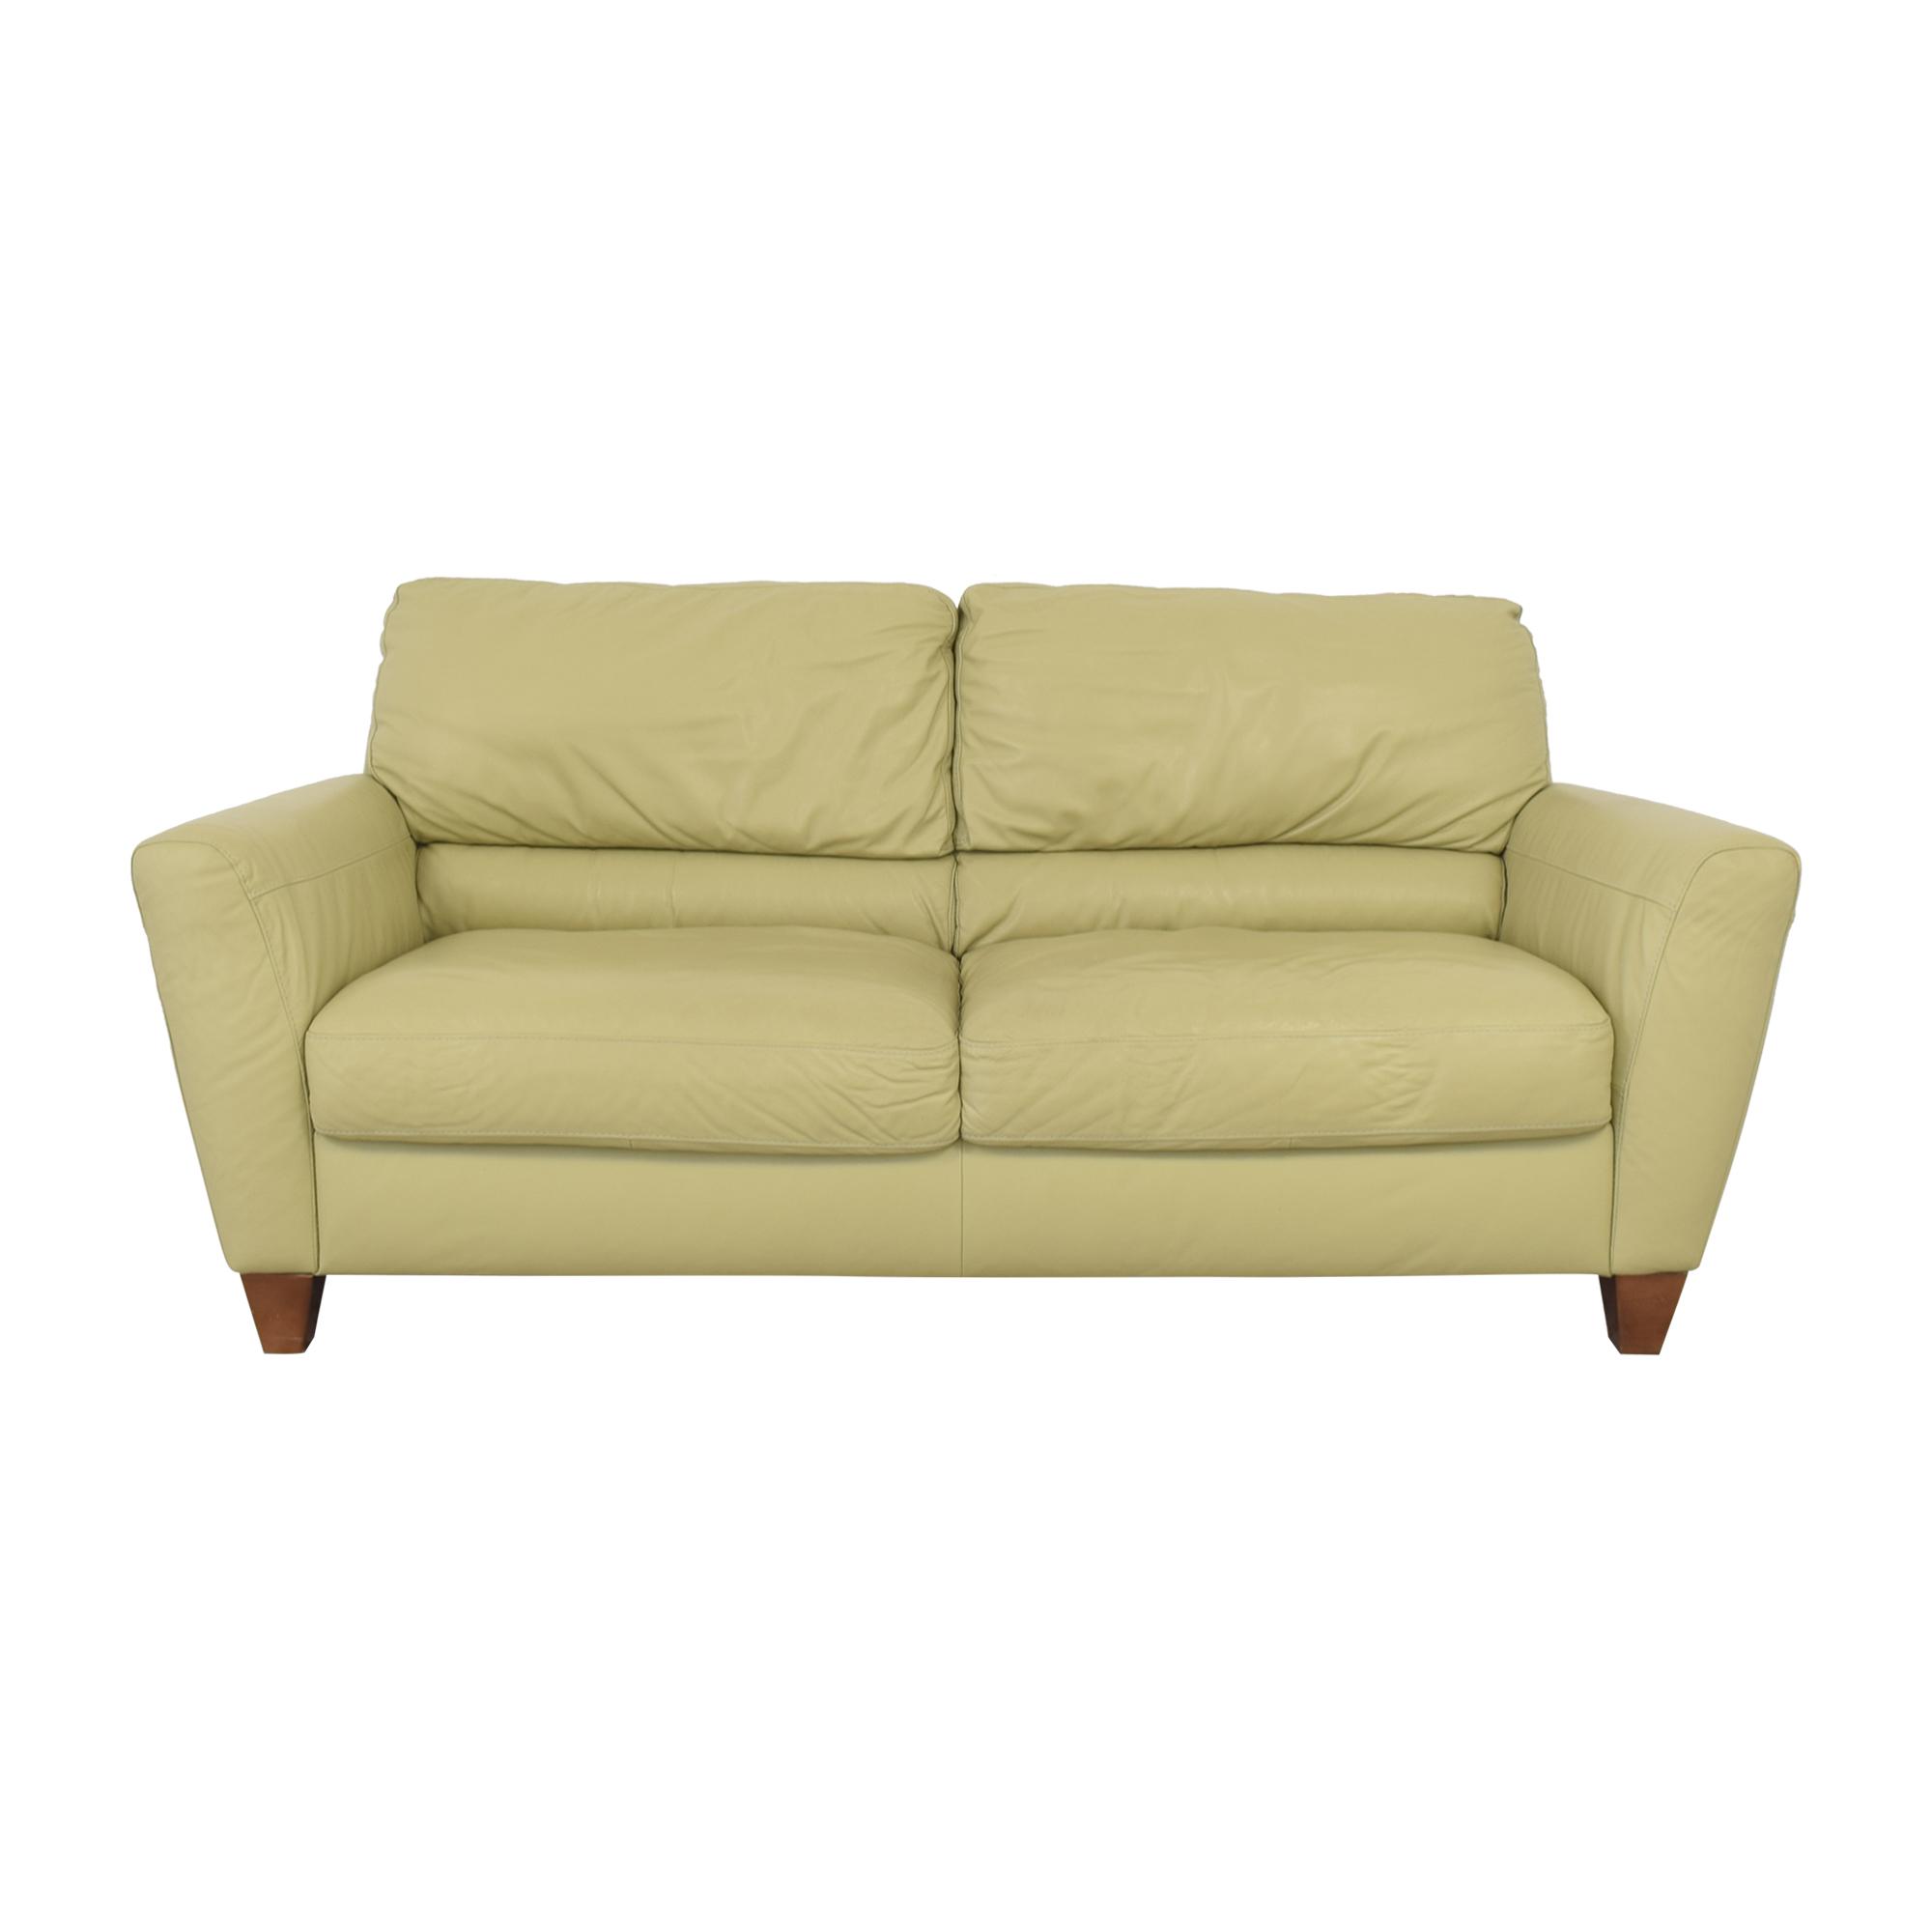 Natuzzi Natuzzi Modern Sofa for sale